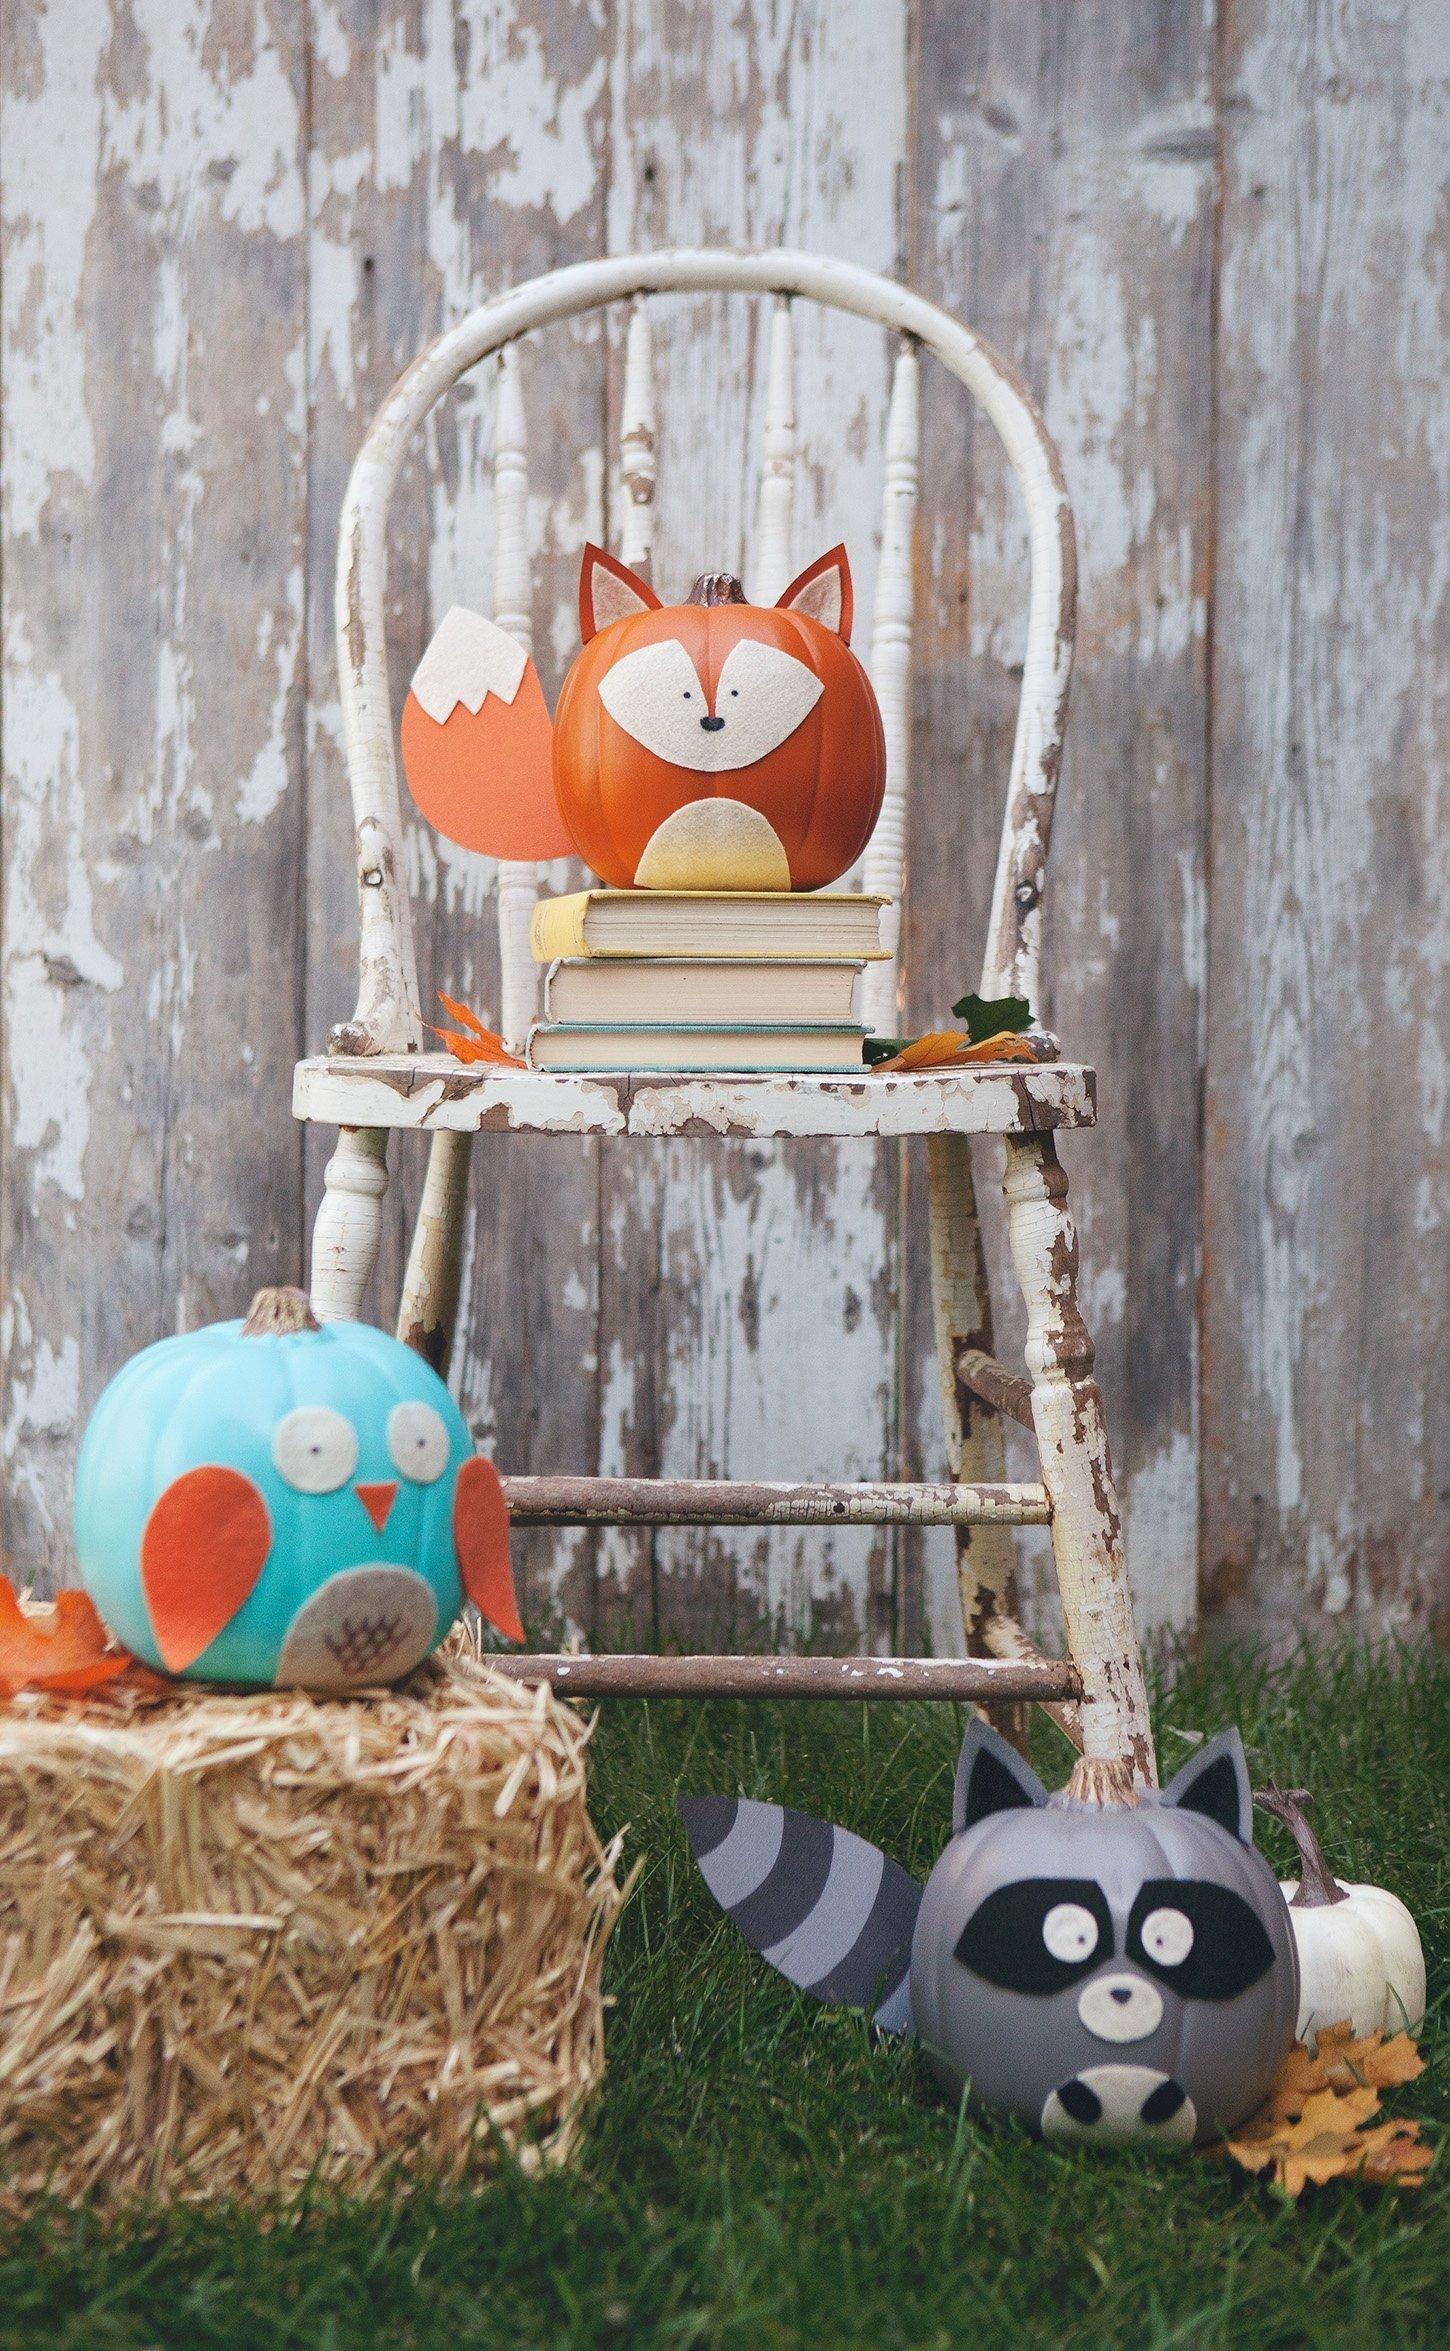 10 Stunning No Carve Pumpkin Decorating Ideas For Kids woodland creature no carve pumpkins 1 2020